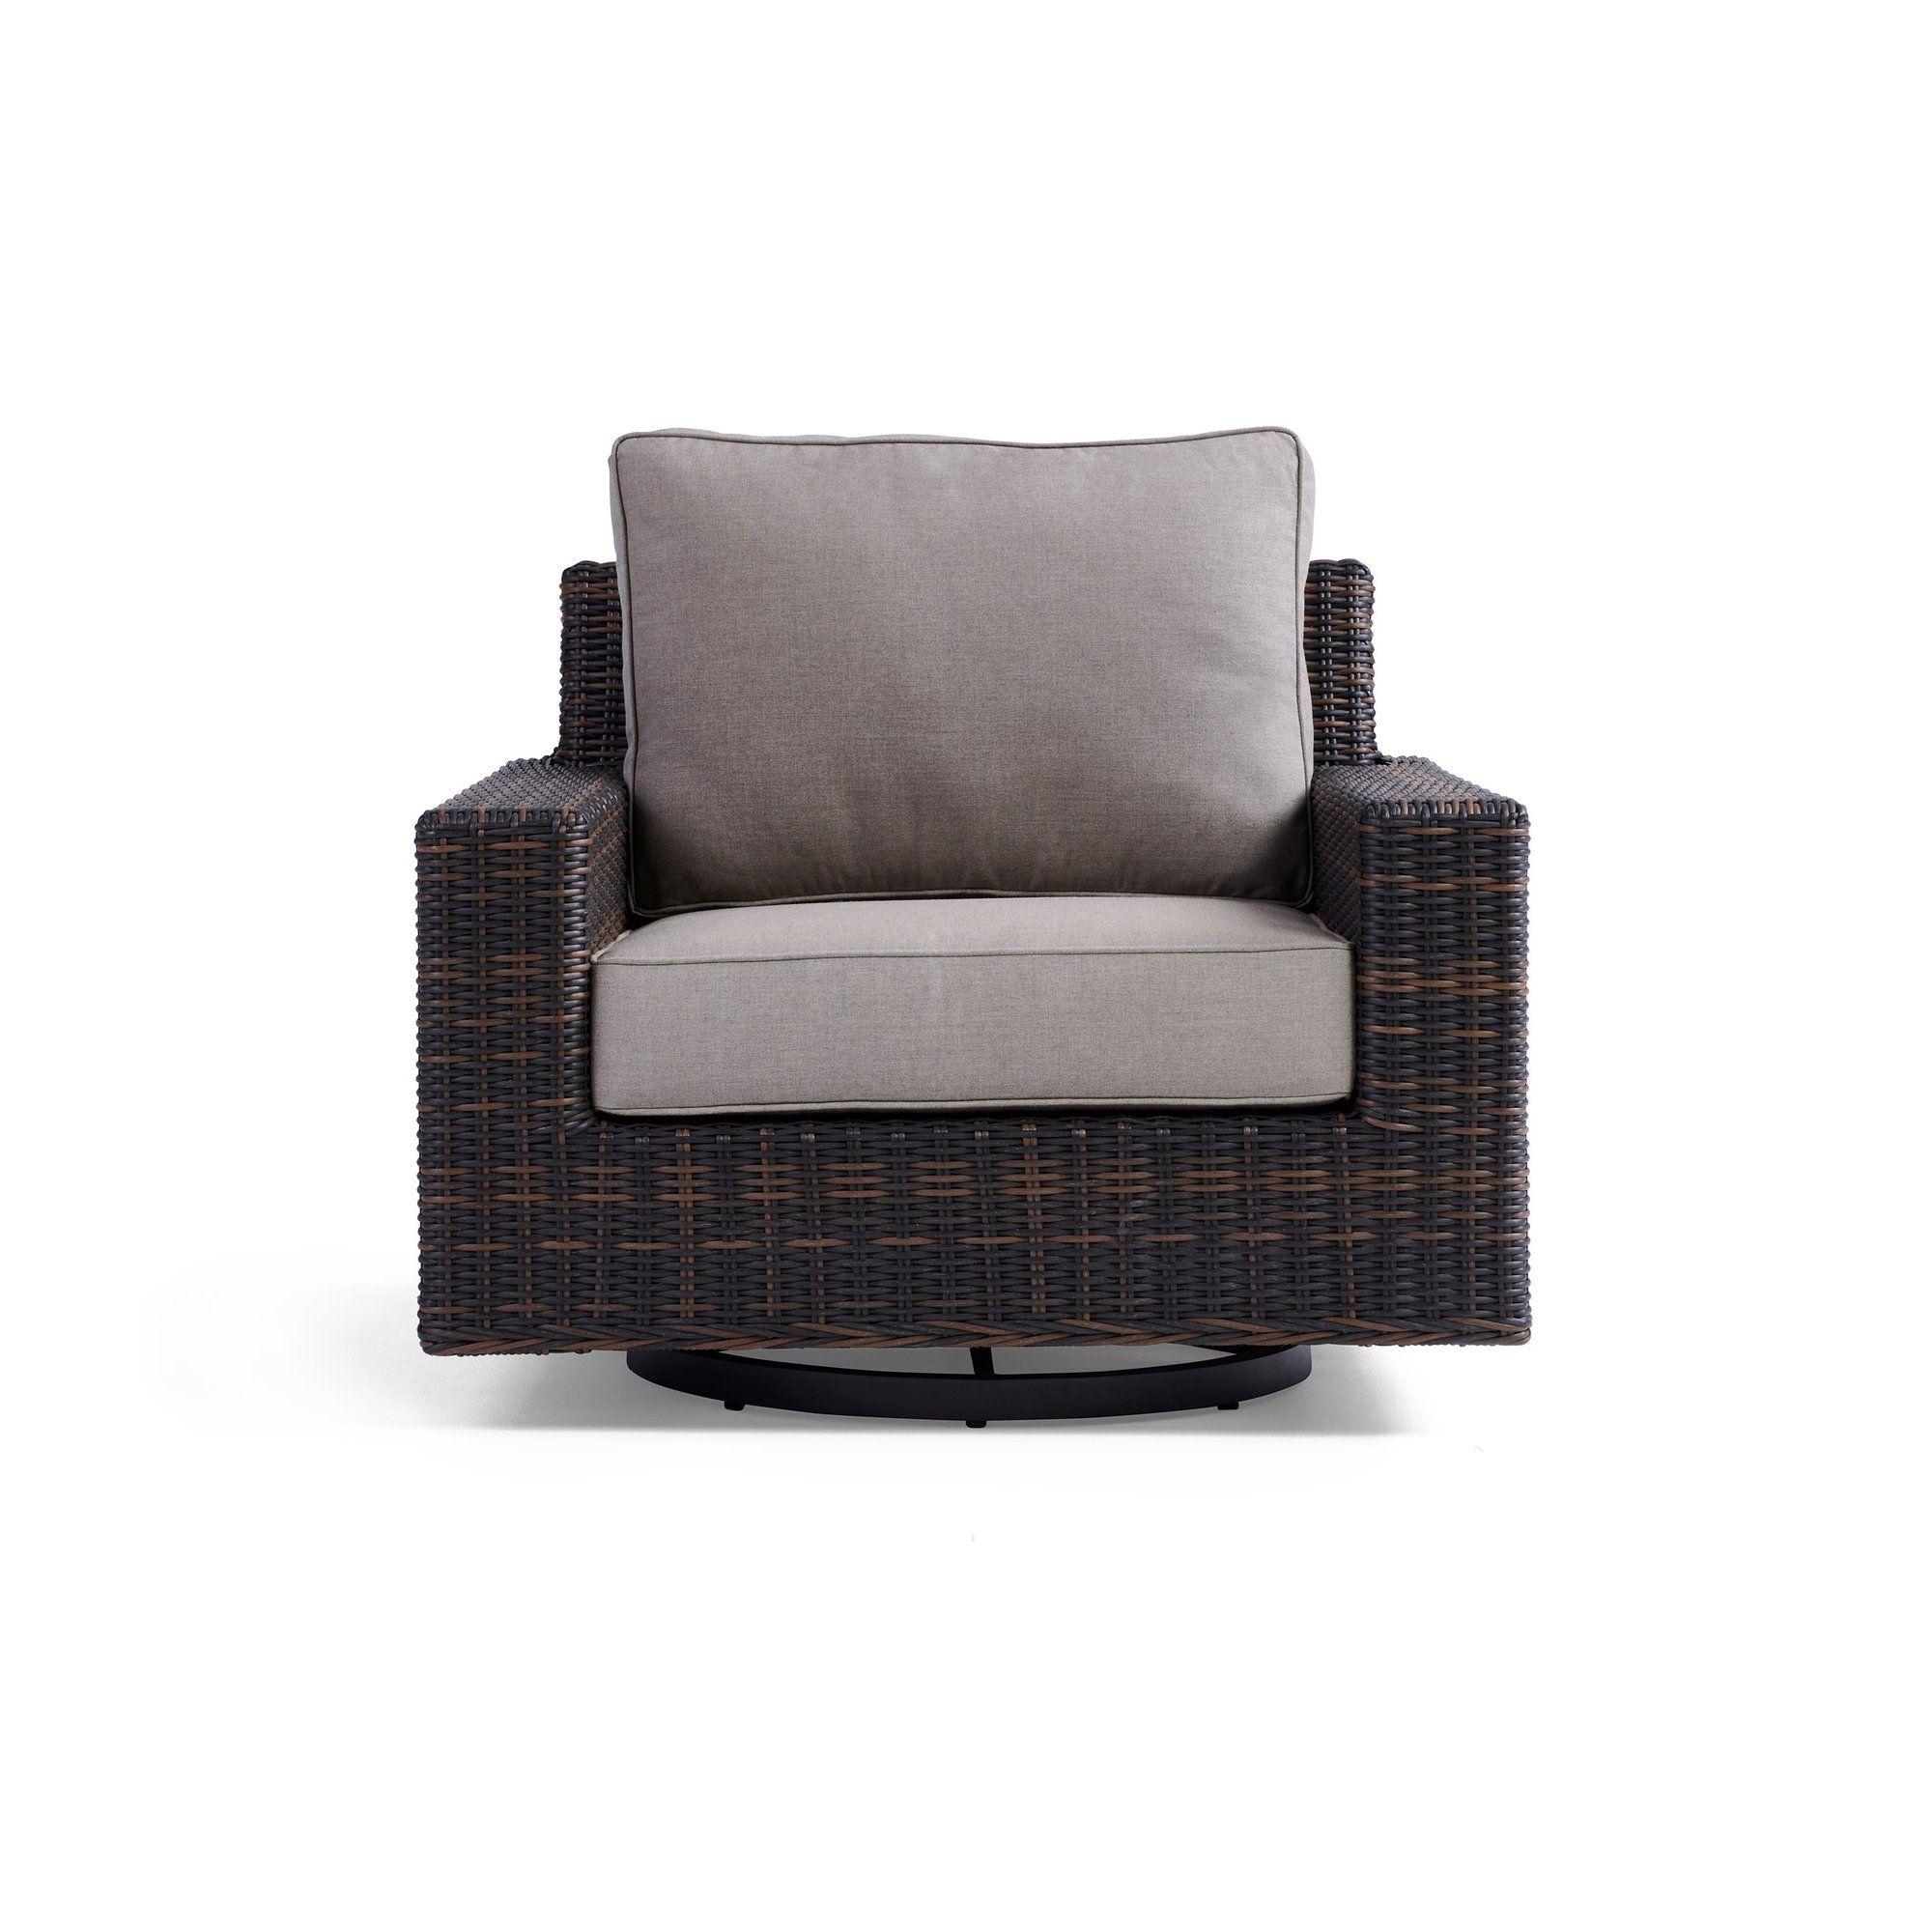 Langdon Outdoor Swivel Glider Chair Swivel glider chair